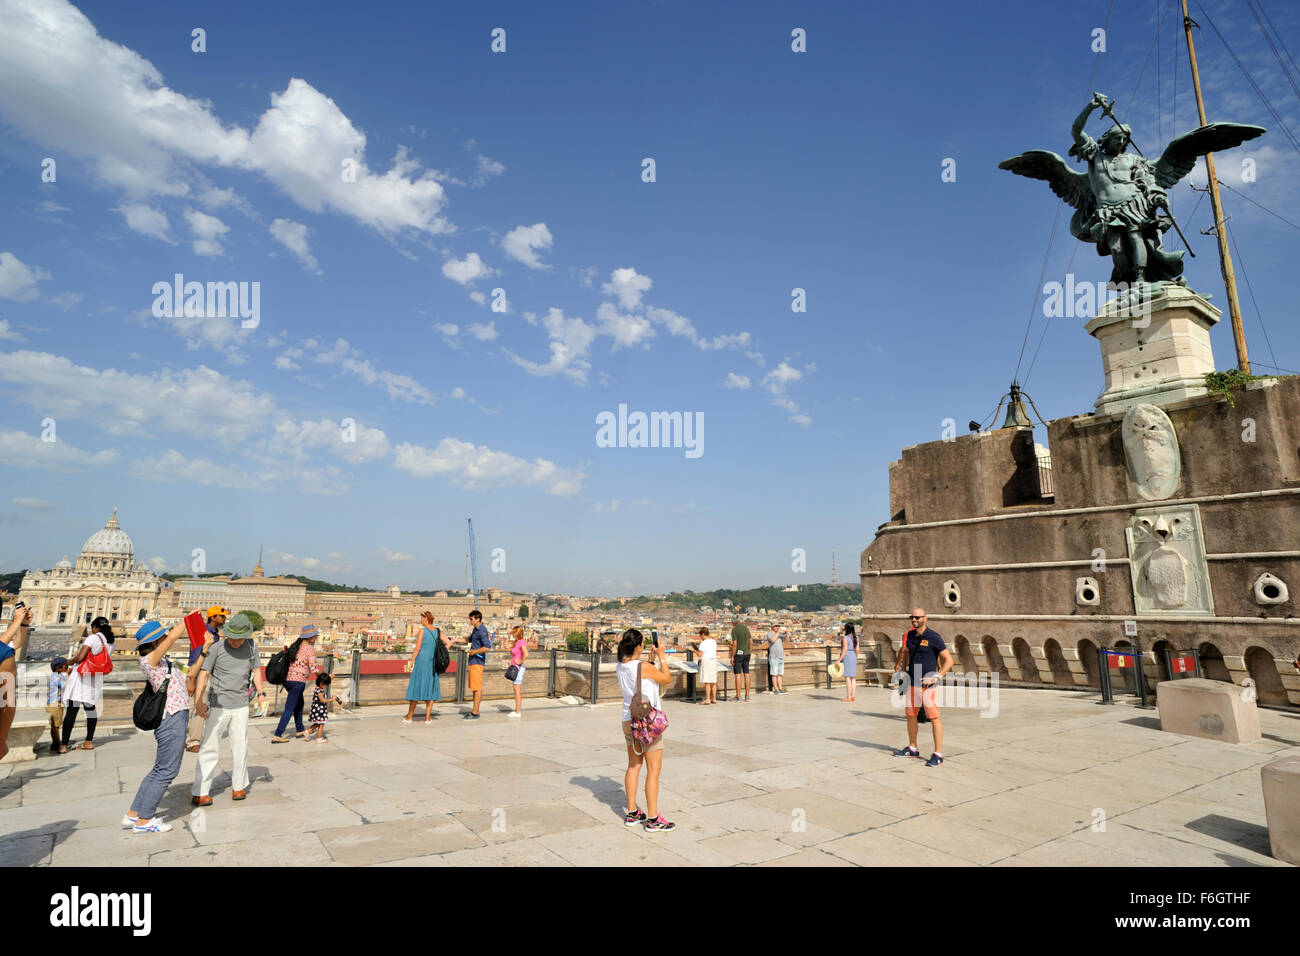 italy, rome, castel sant'angelo, terrace - Stock Image